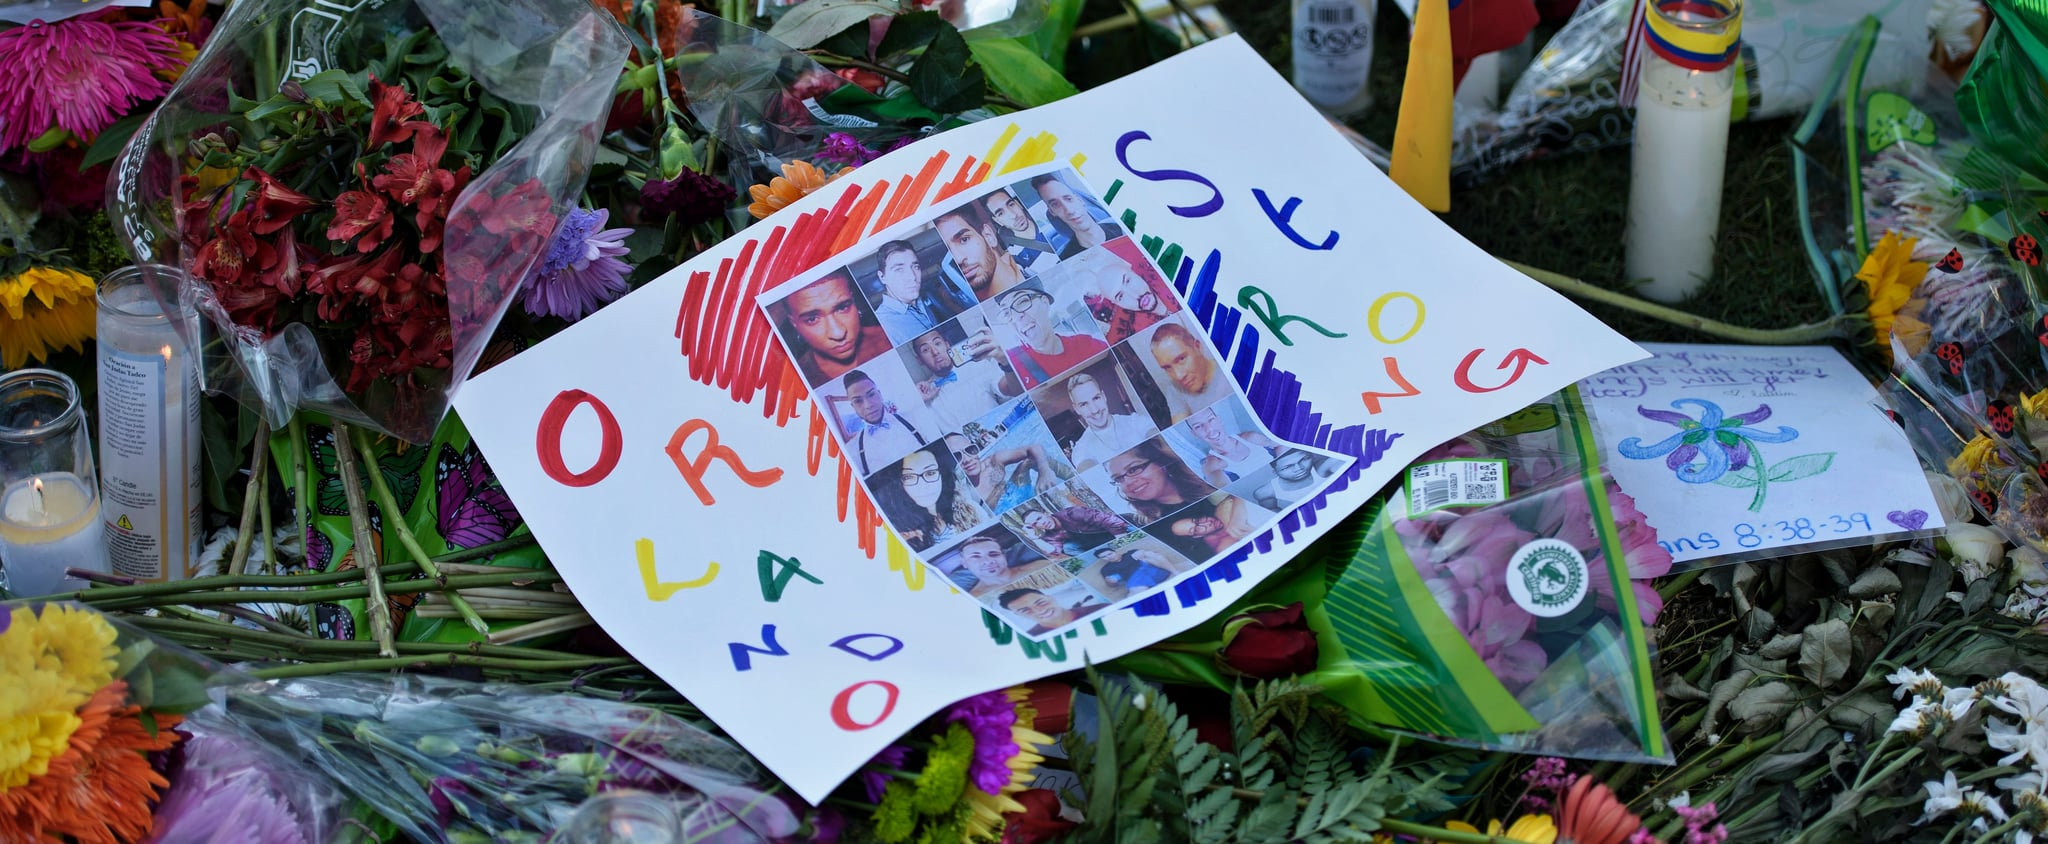 Joe Biden to Sign Bill Making Pulse a National Memorial